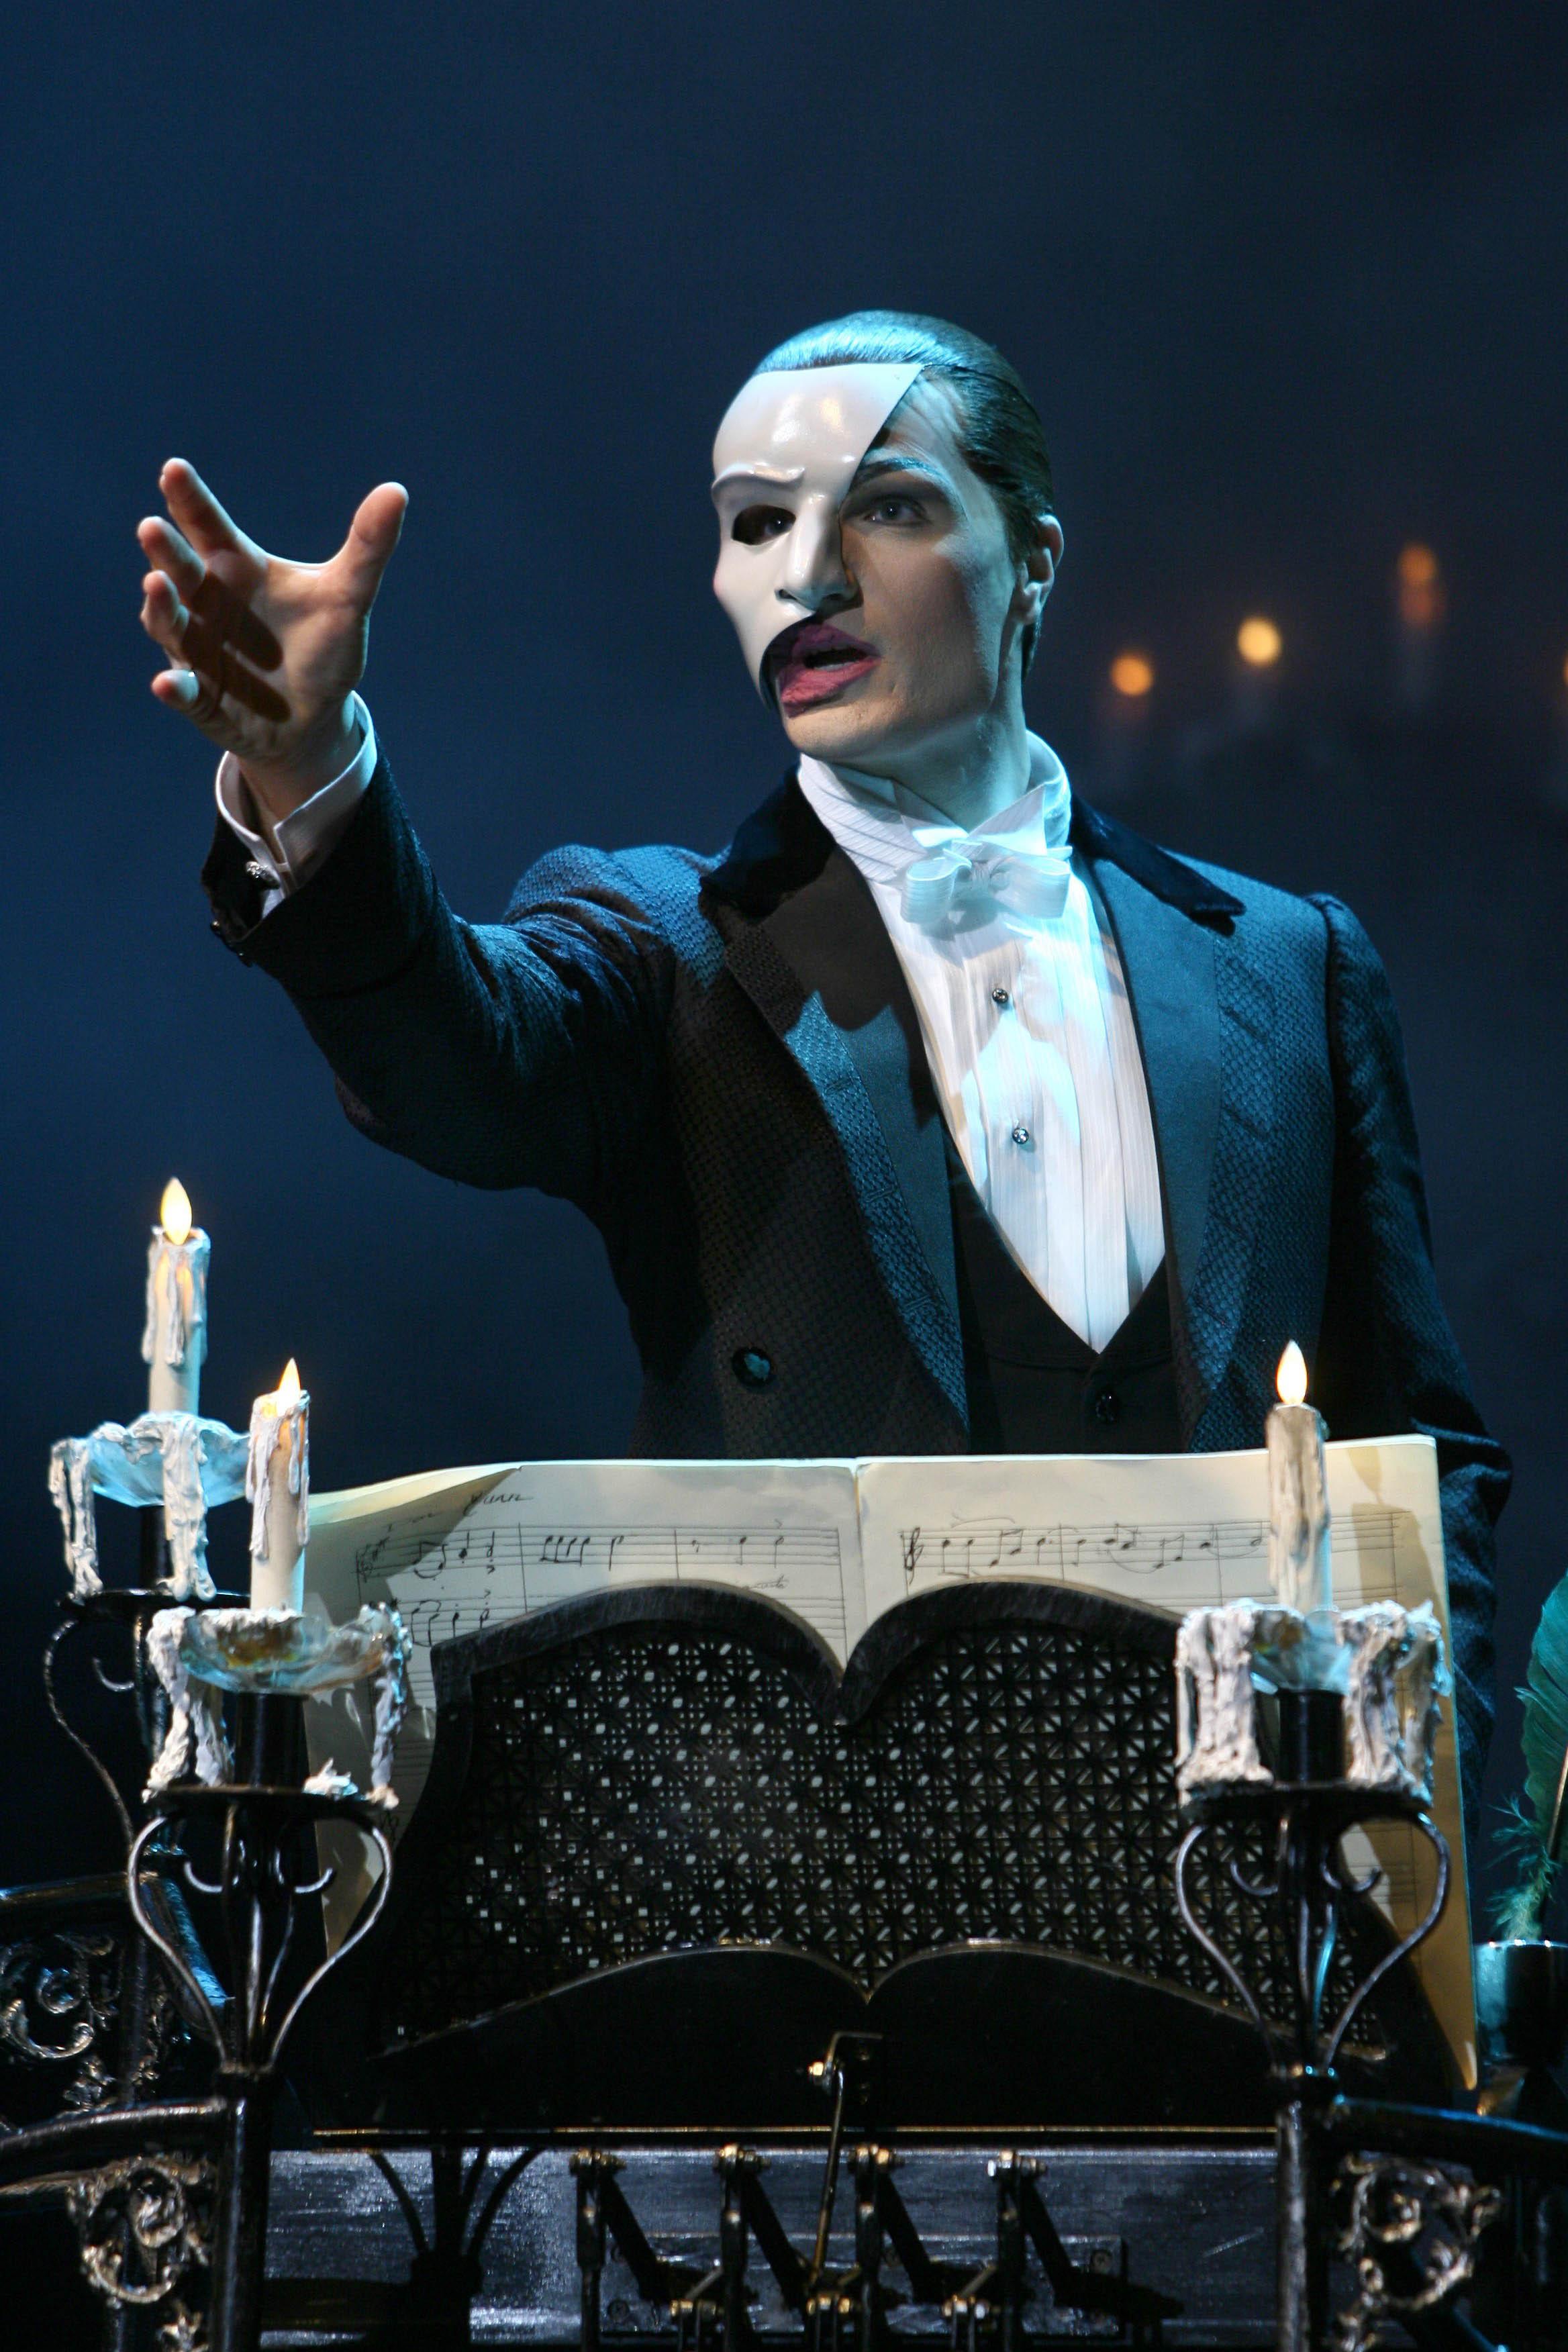 Script of phantom of the opera